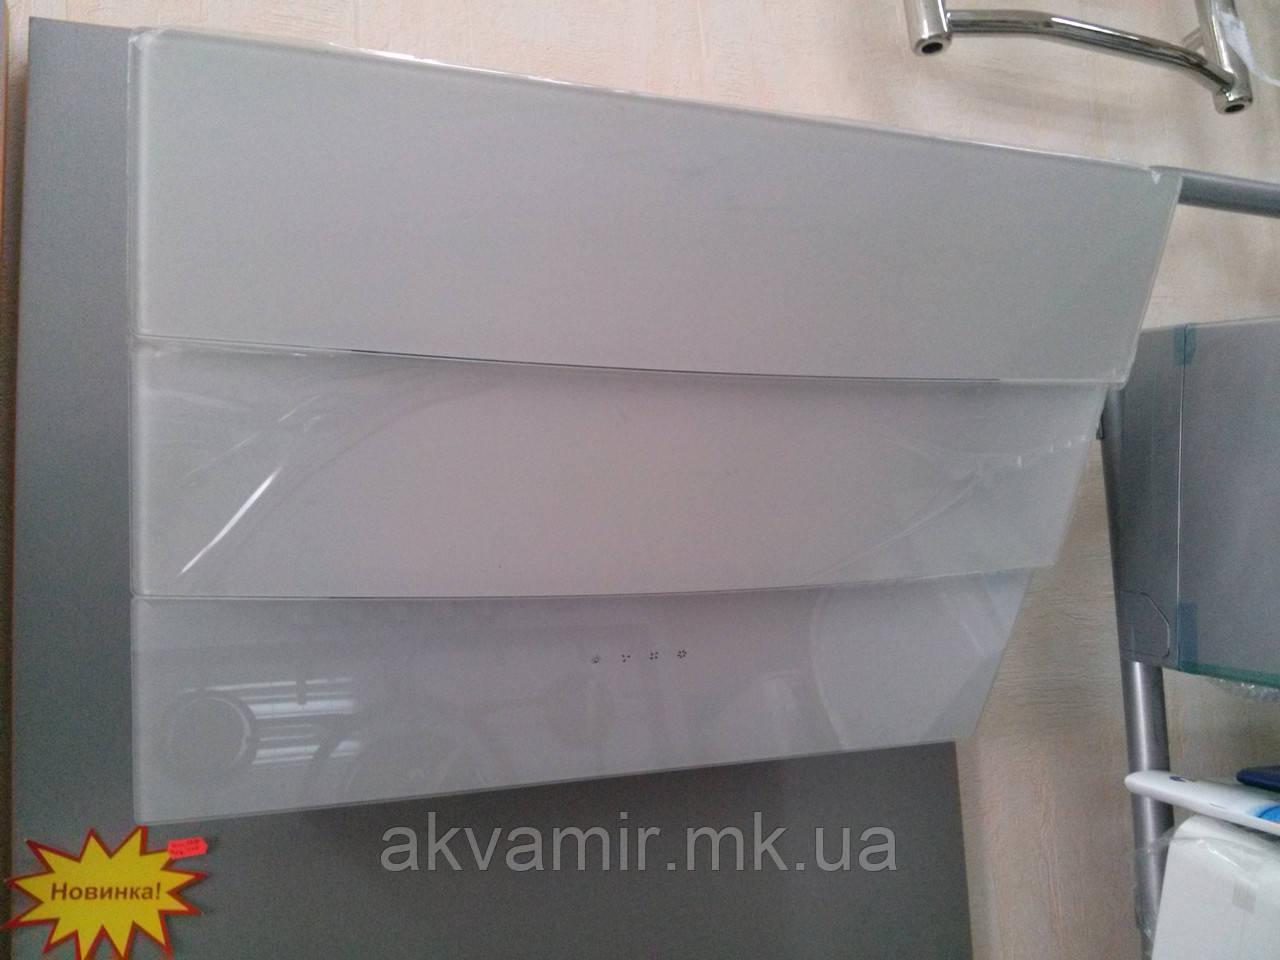 Вытяжка для кухни Fabiano Stella 60 White (белая) наклонная